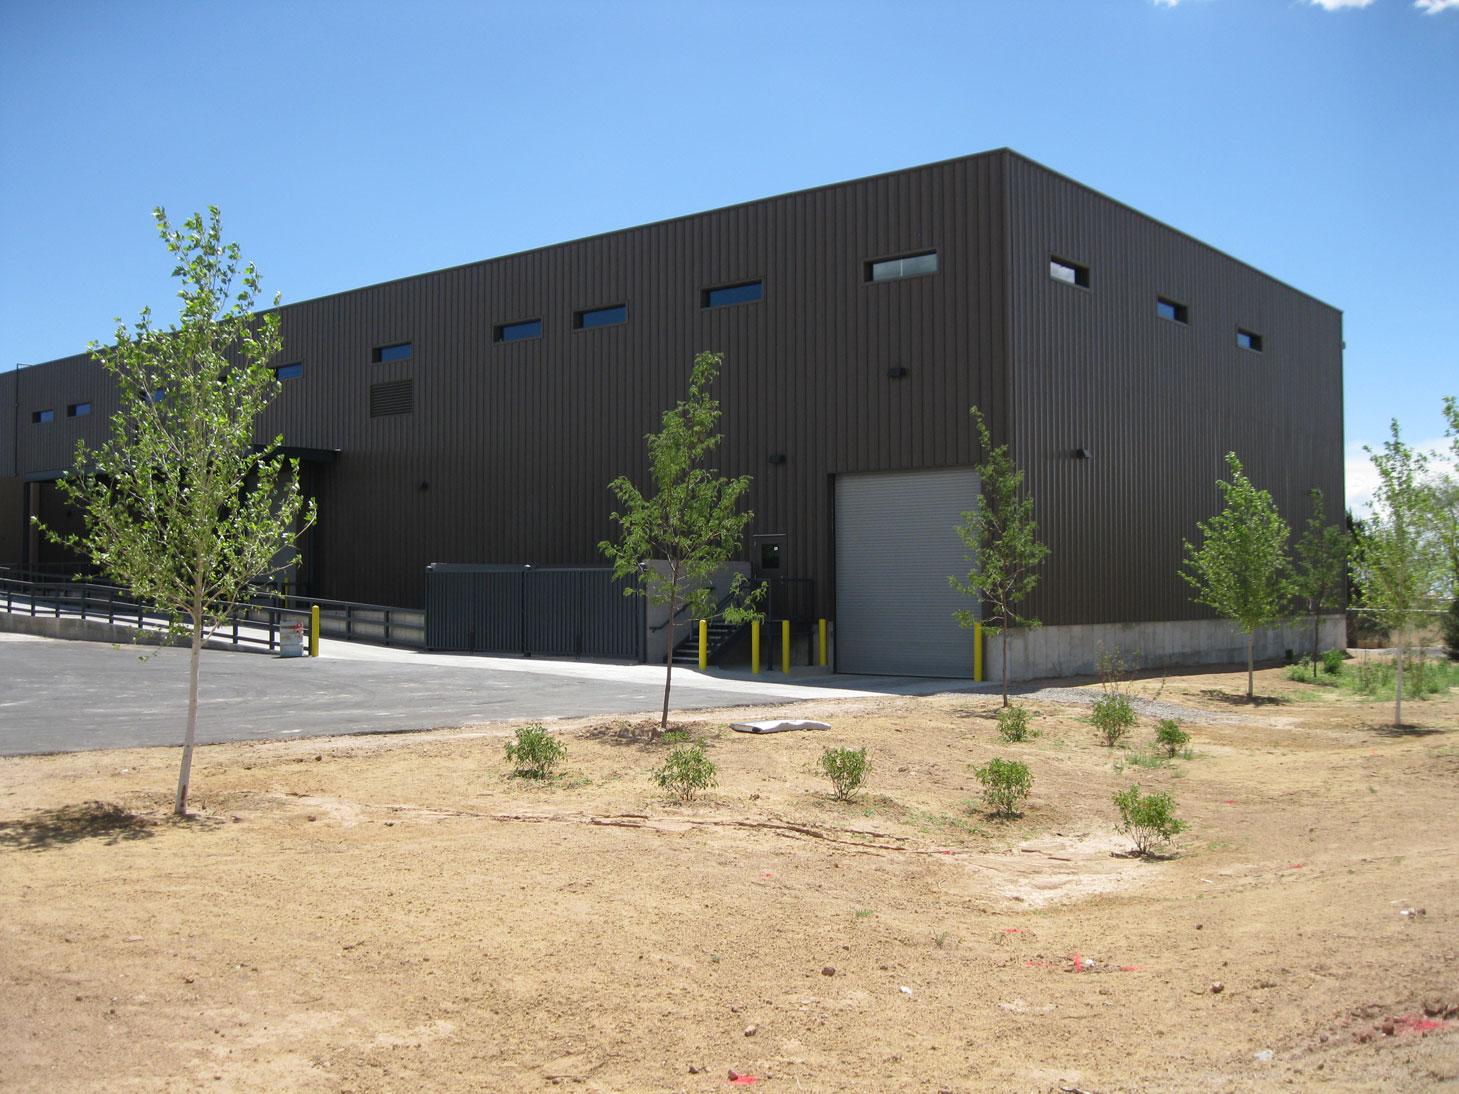 Industrial CleanAIR Systems – Caterpillar Klinger Constructors LLC #1262B9